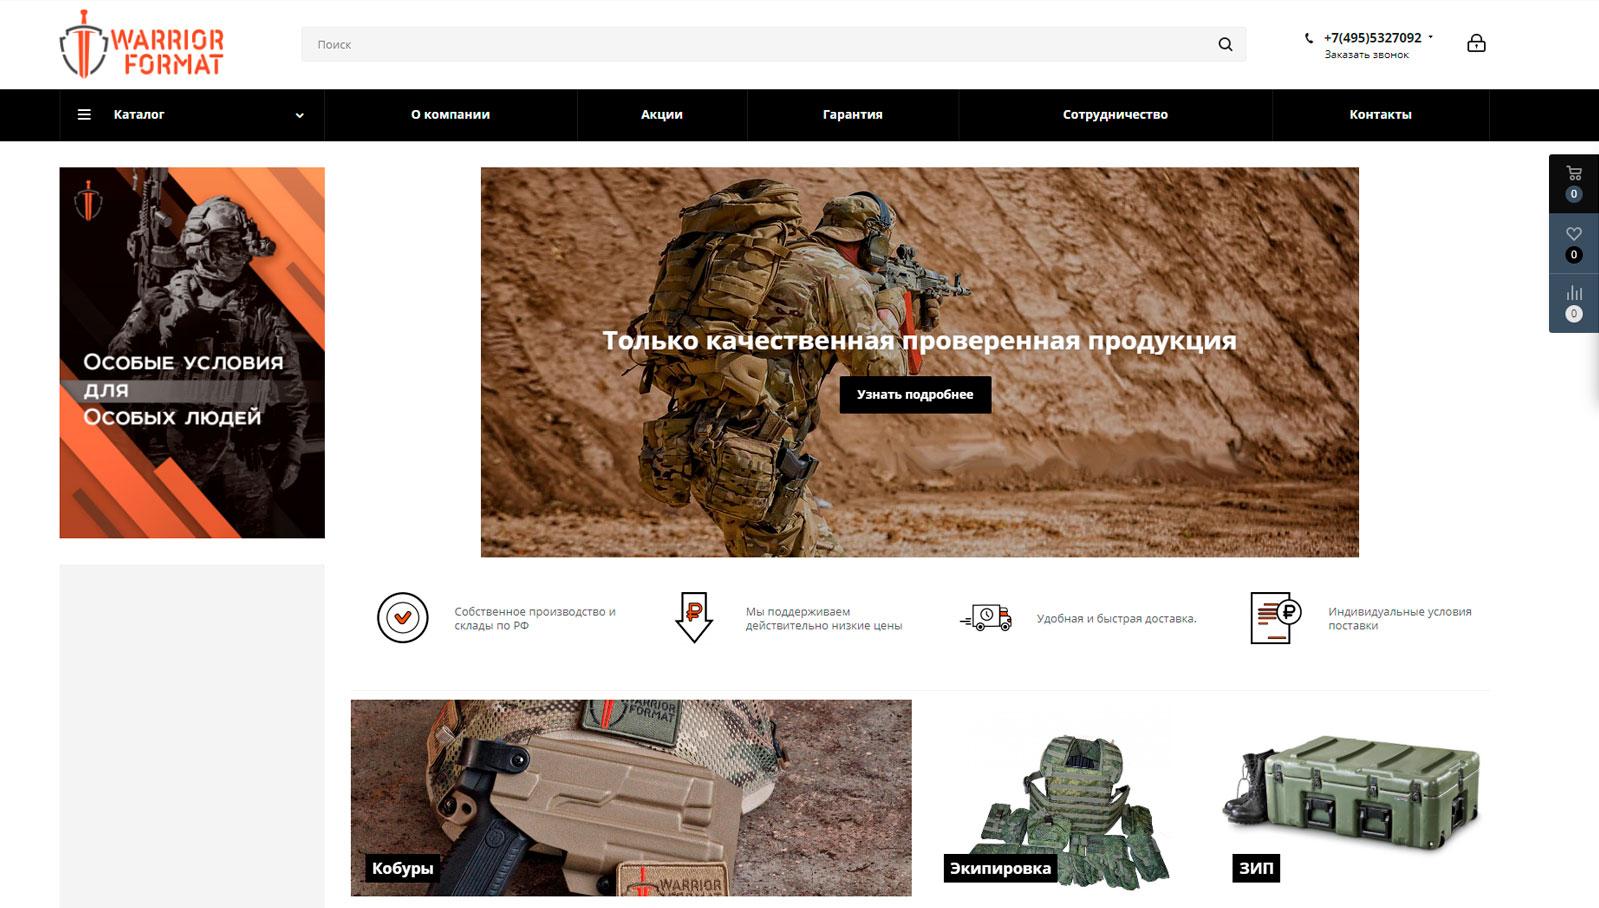 SPS_sajt_warrior-format.ru